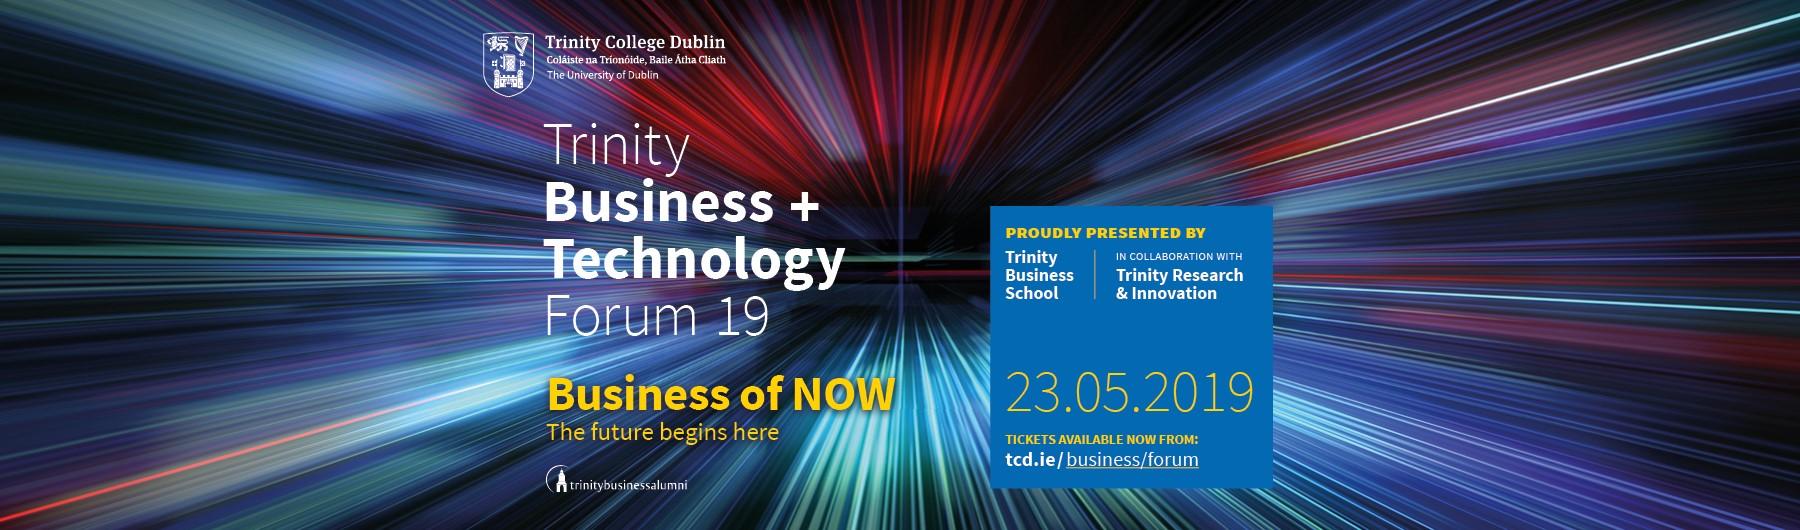 Trinity Business + Technology Forum 19